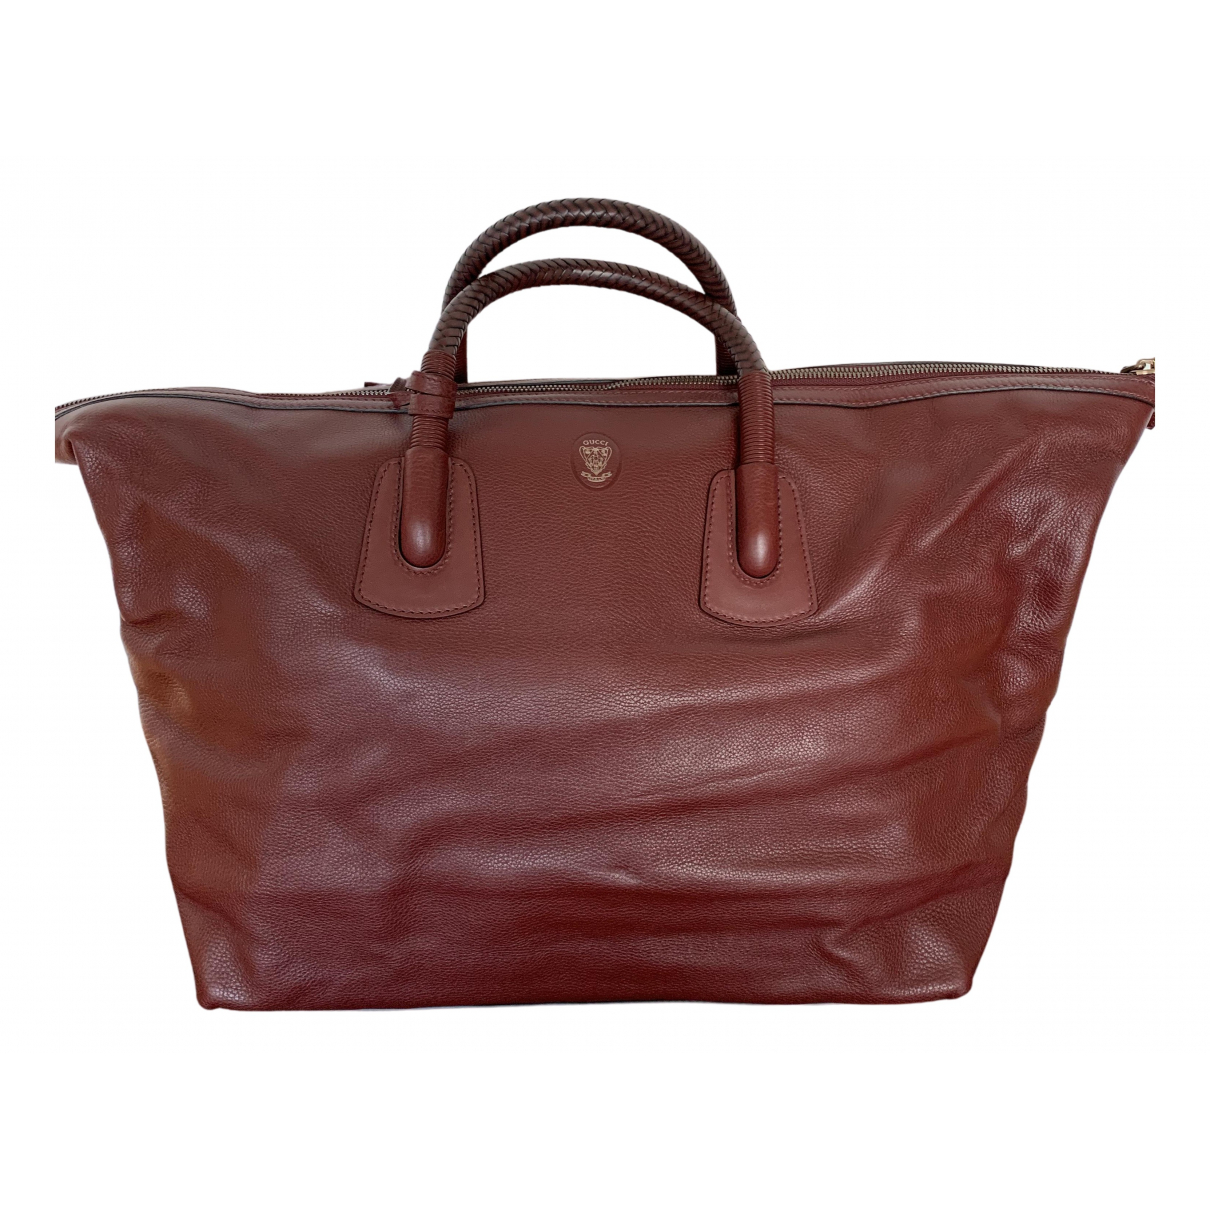 Gucci N Burgundy Leather bag for Men N